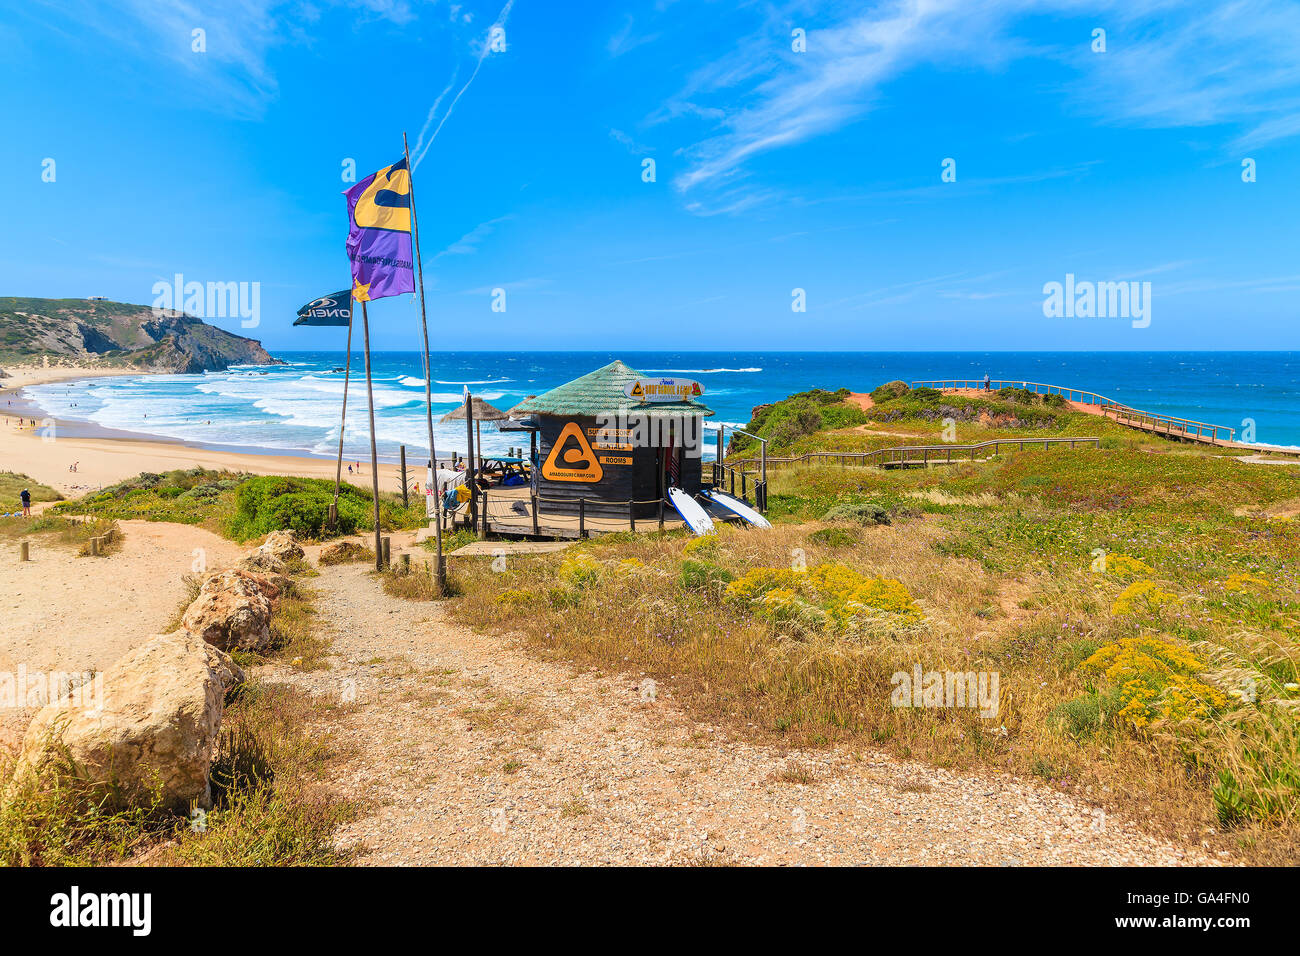 AMADO BEACH, PORTUGAL - MAY 15, 2015: surfing school kiosk on Praia do Amado beach in spring, Algarve region, Portugal. Stock Photo